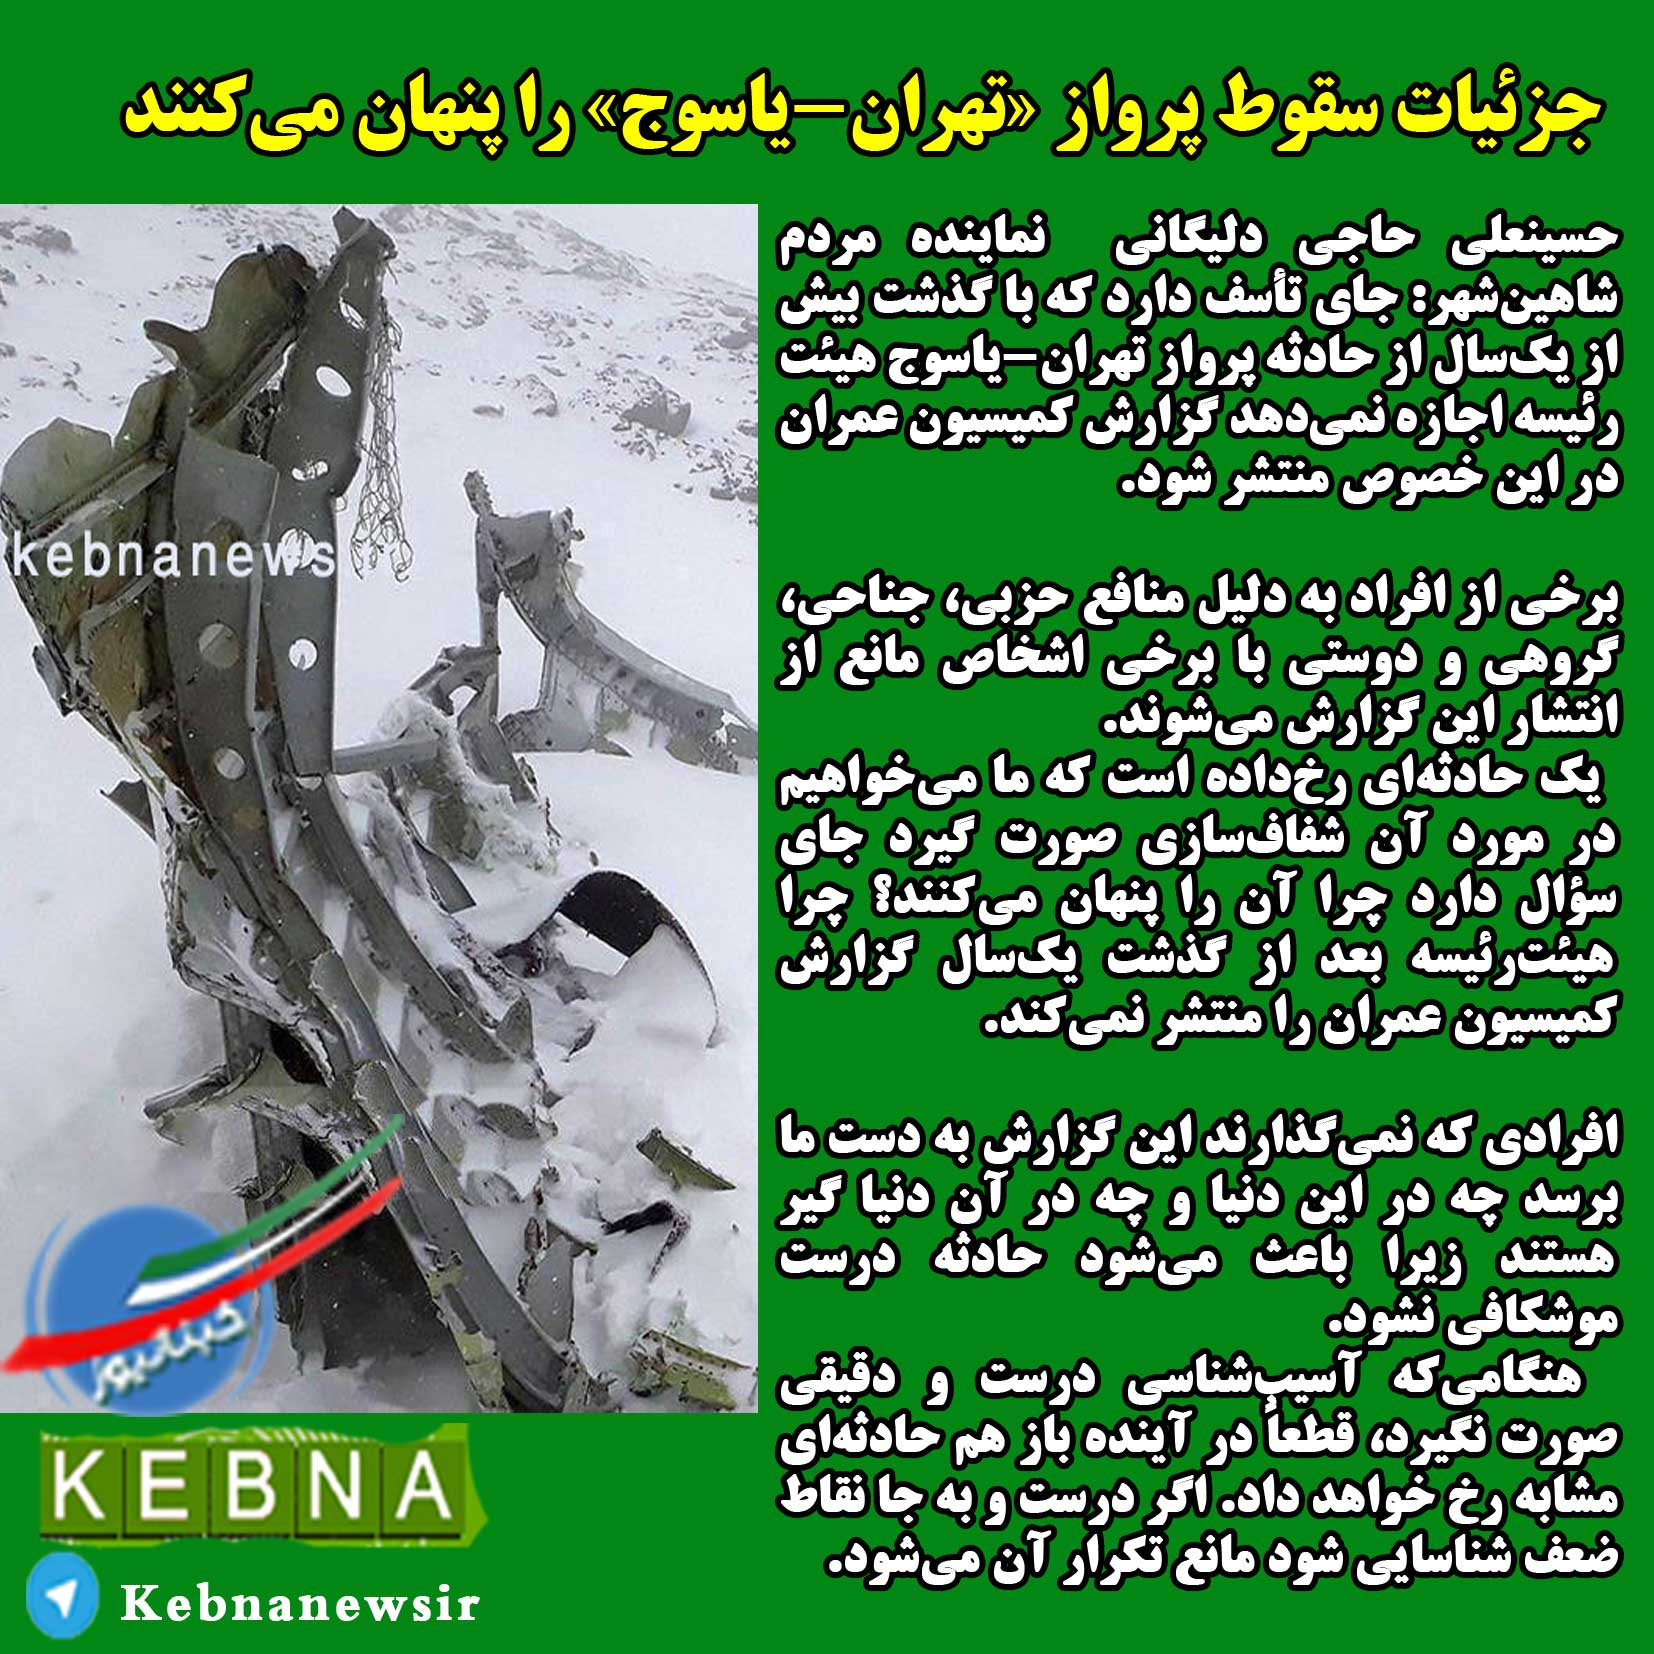 http://www.kebnanews.ir/images/docs/files/000410/nf00410431-1.jpg